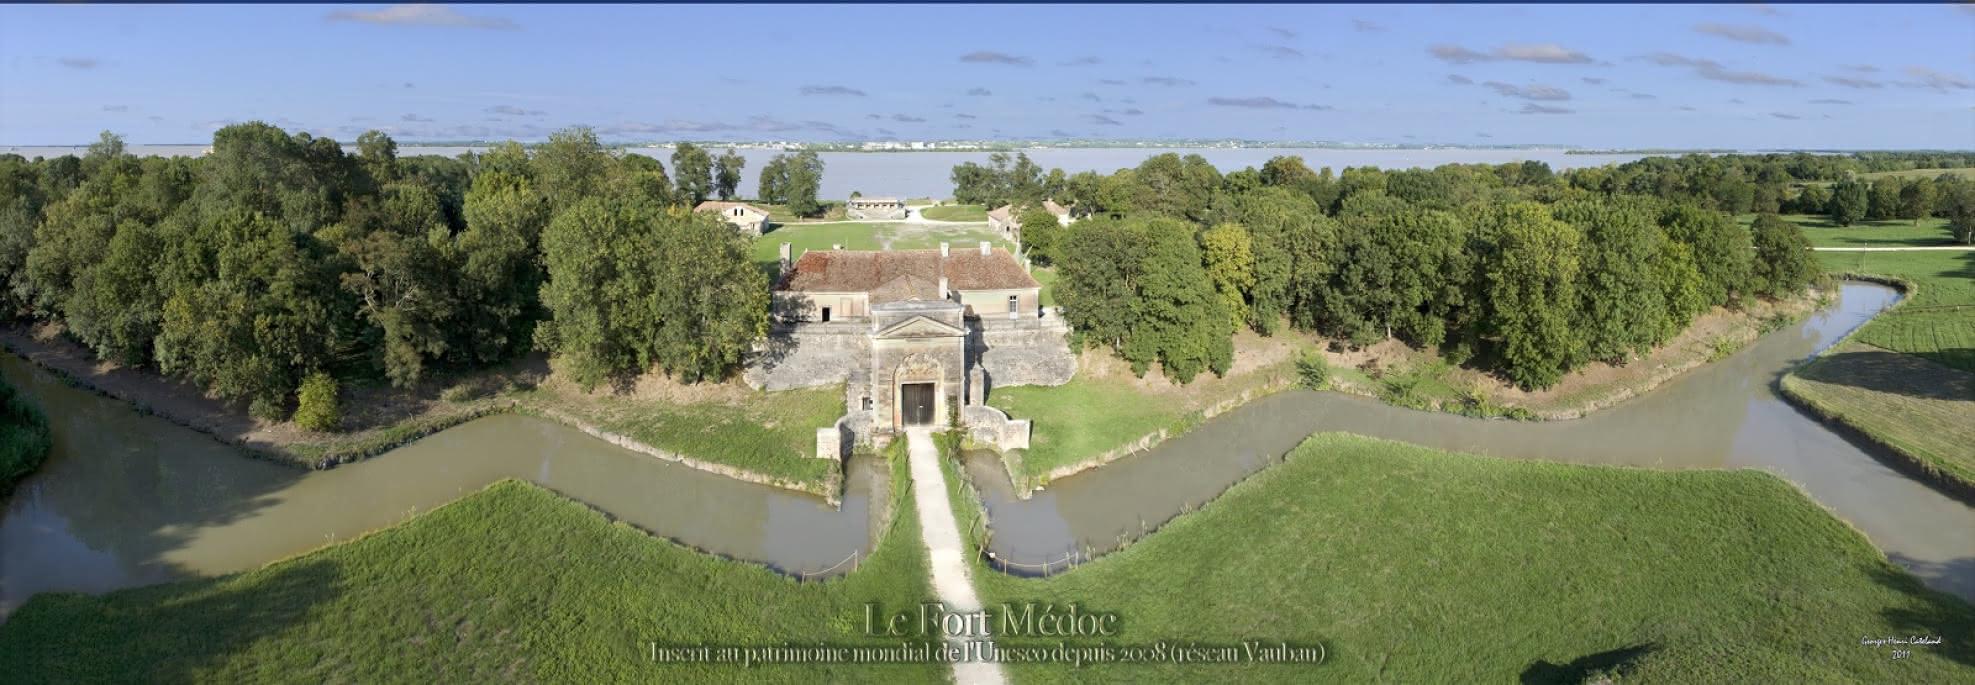 Photo-1--Fort-Medoc--Vue-du-ciel----CAPELAN